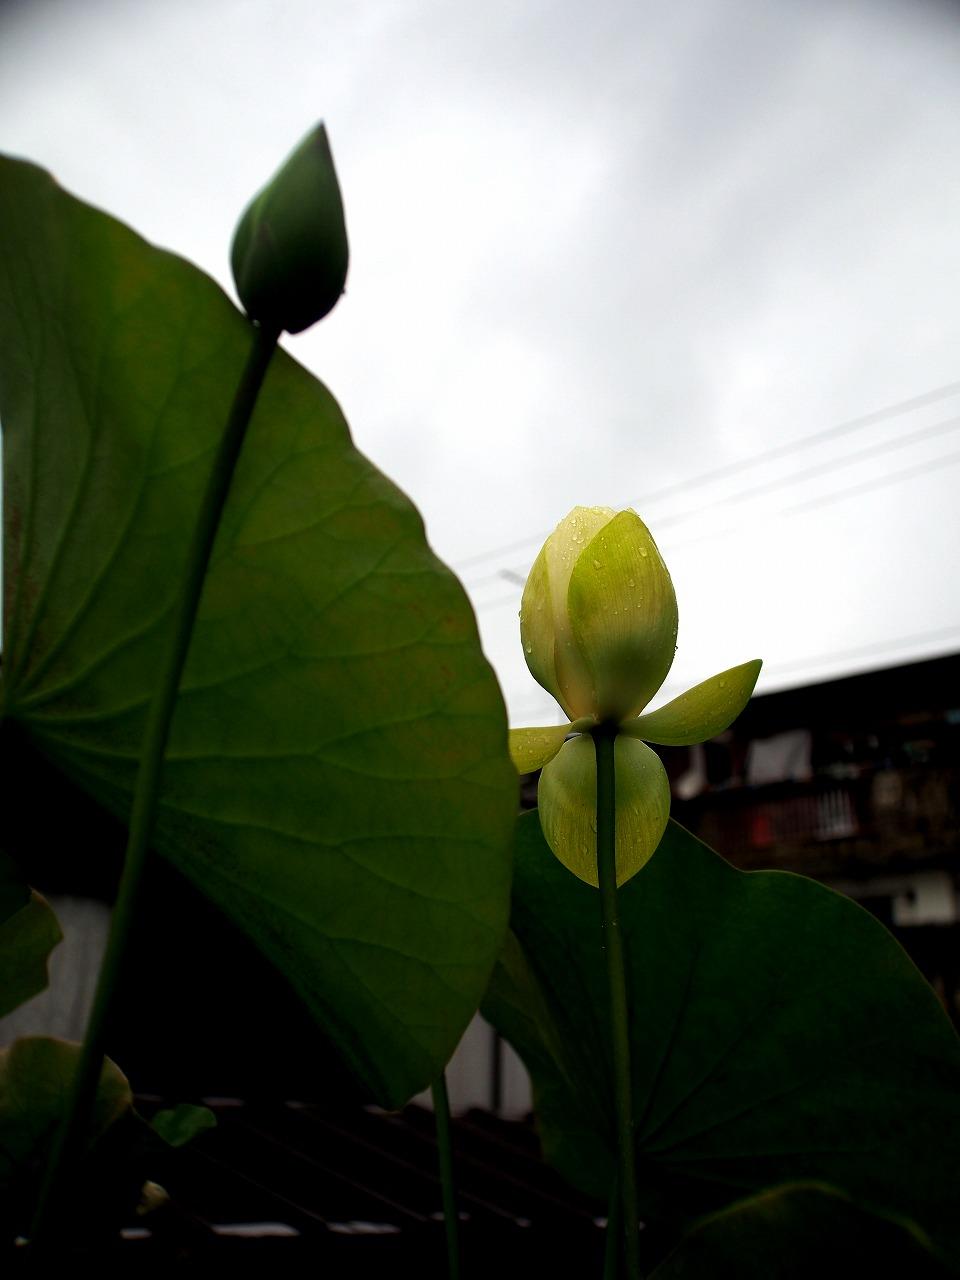 20150626-07_Kougyokuhai-P01.jpg